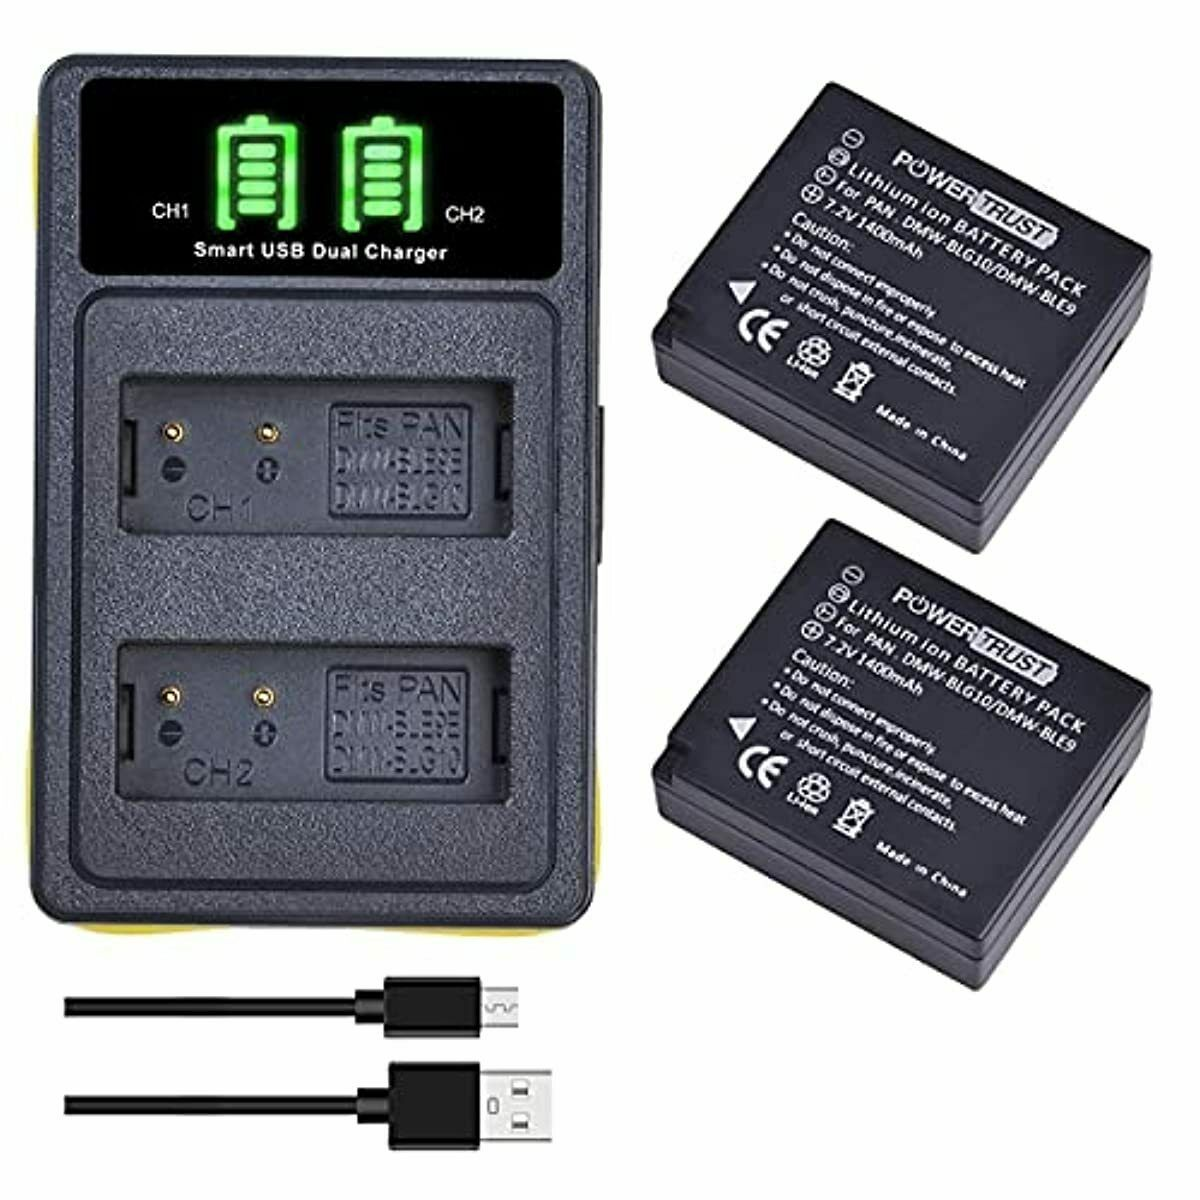 PowerTrust 2Pcs DMW-BLG10 DMW-BLG10E Battery and Dual USB Charger for Panasonic